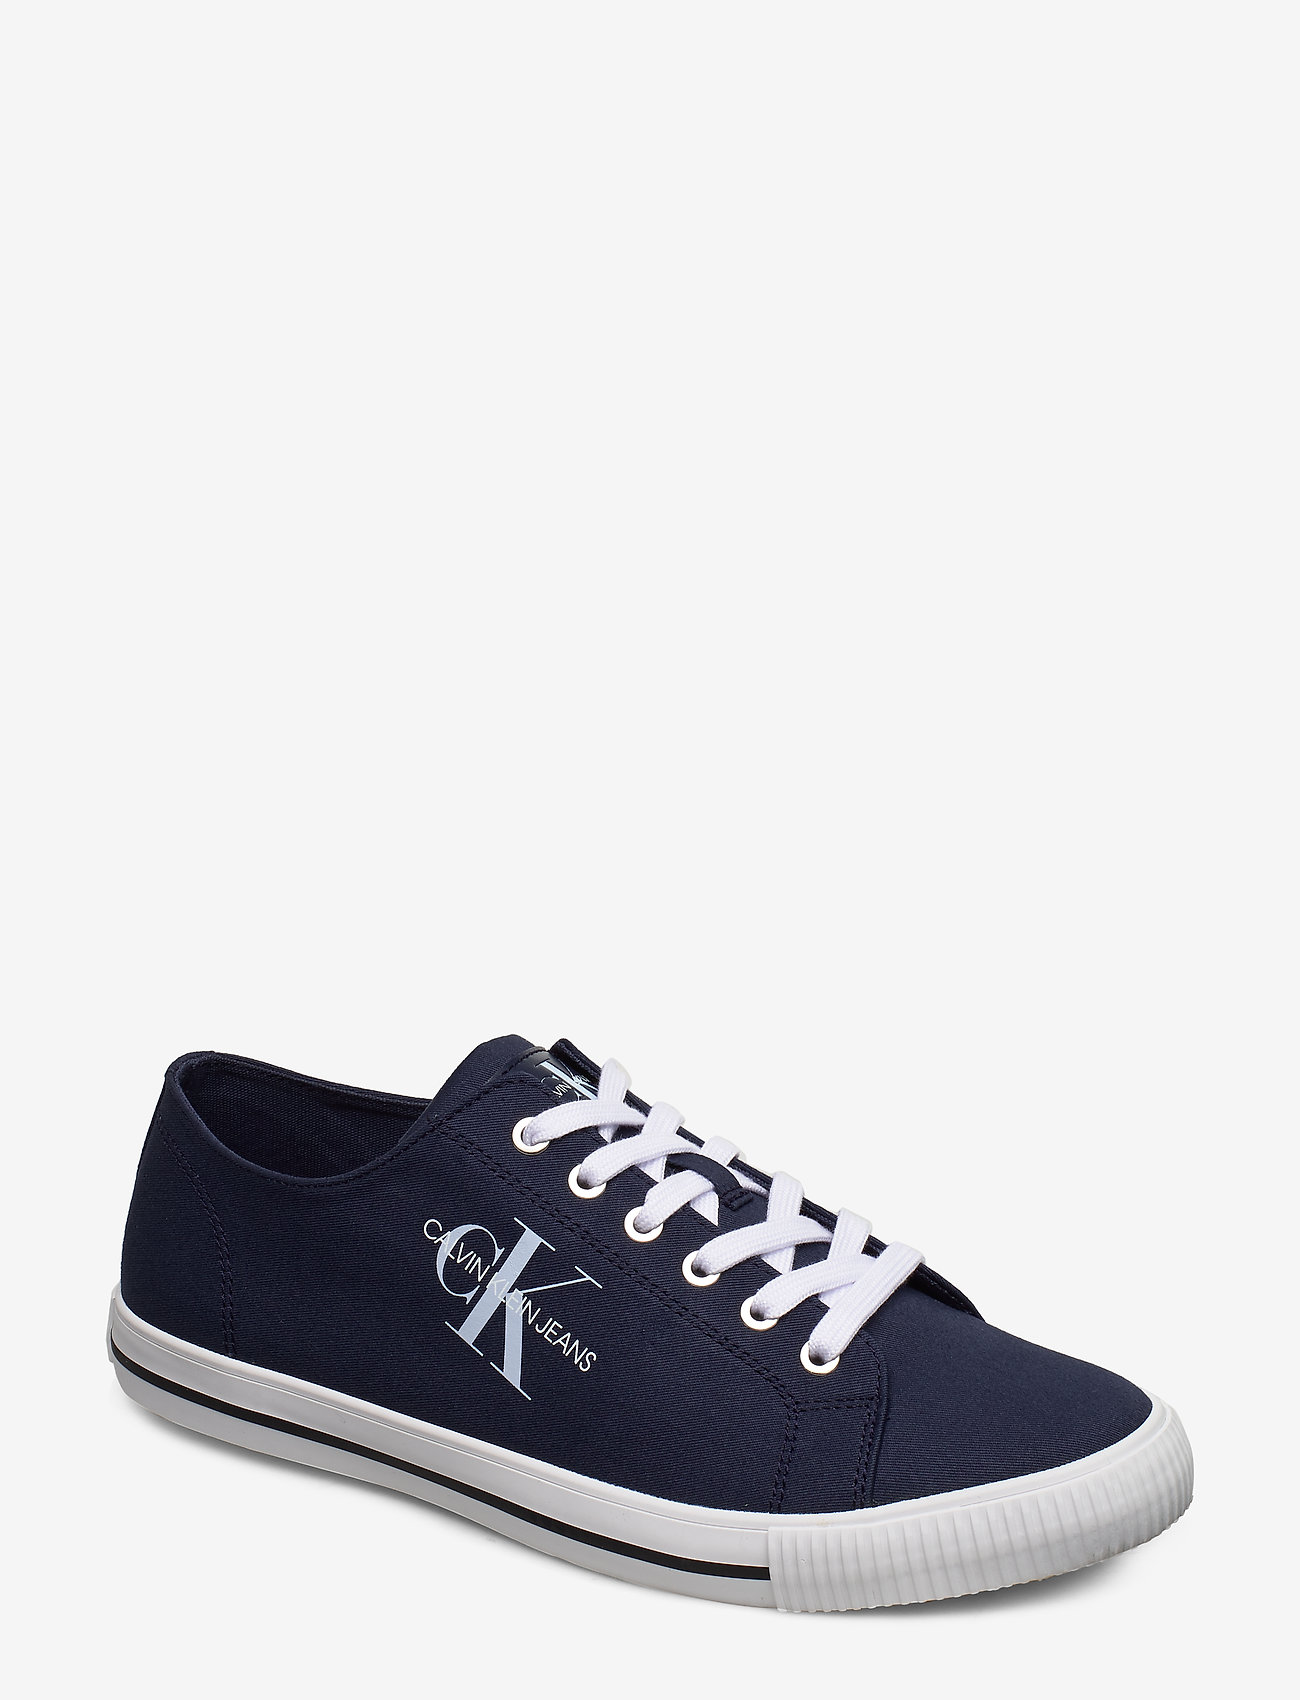 Calvin Klein - AURELIO - laag sneakers - navy - 0